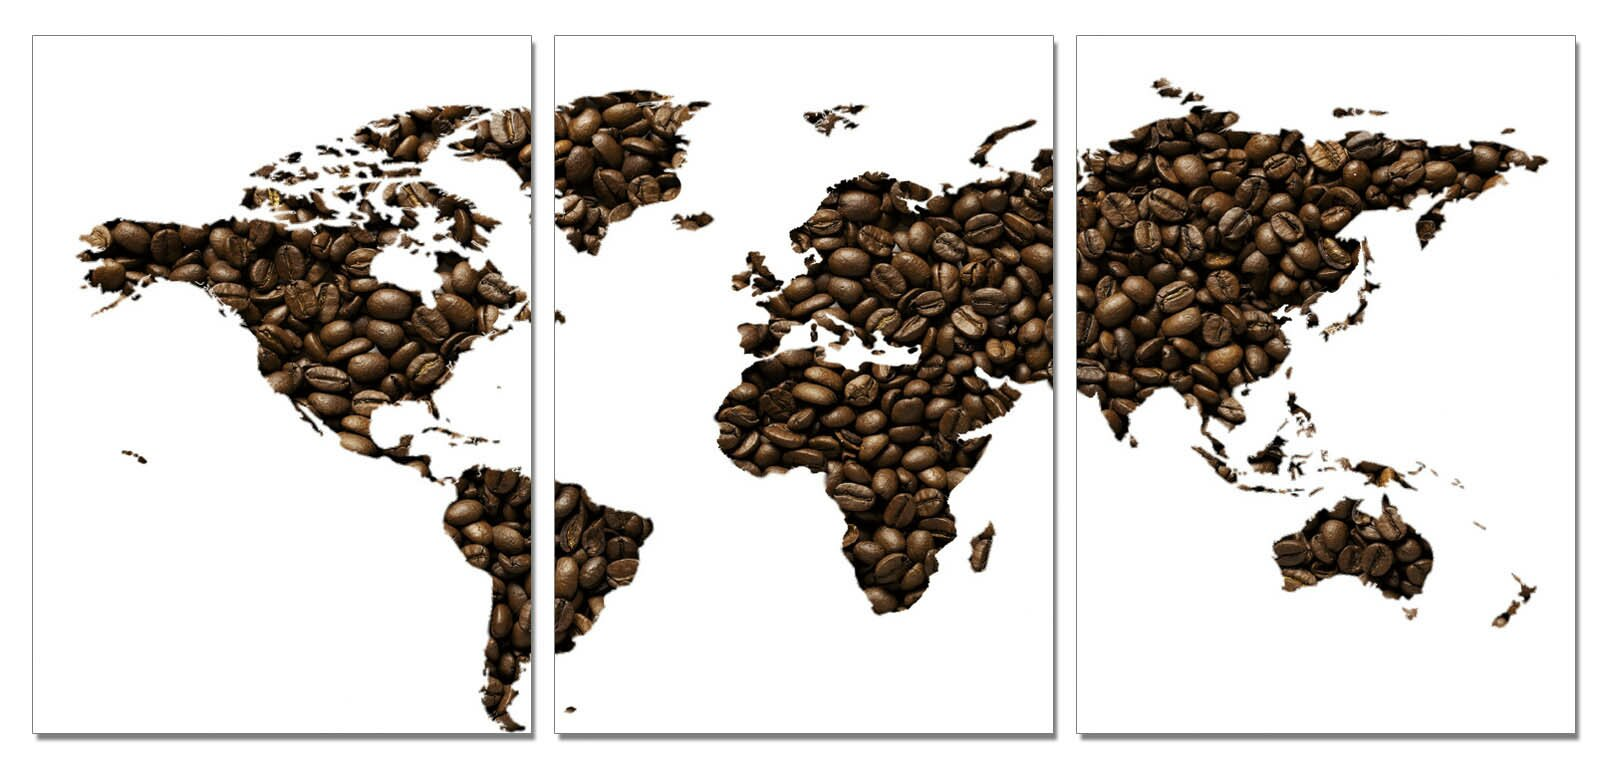 World Map Coffee World Map Bacon World Map Beer World Map Tee - World map 3